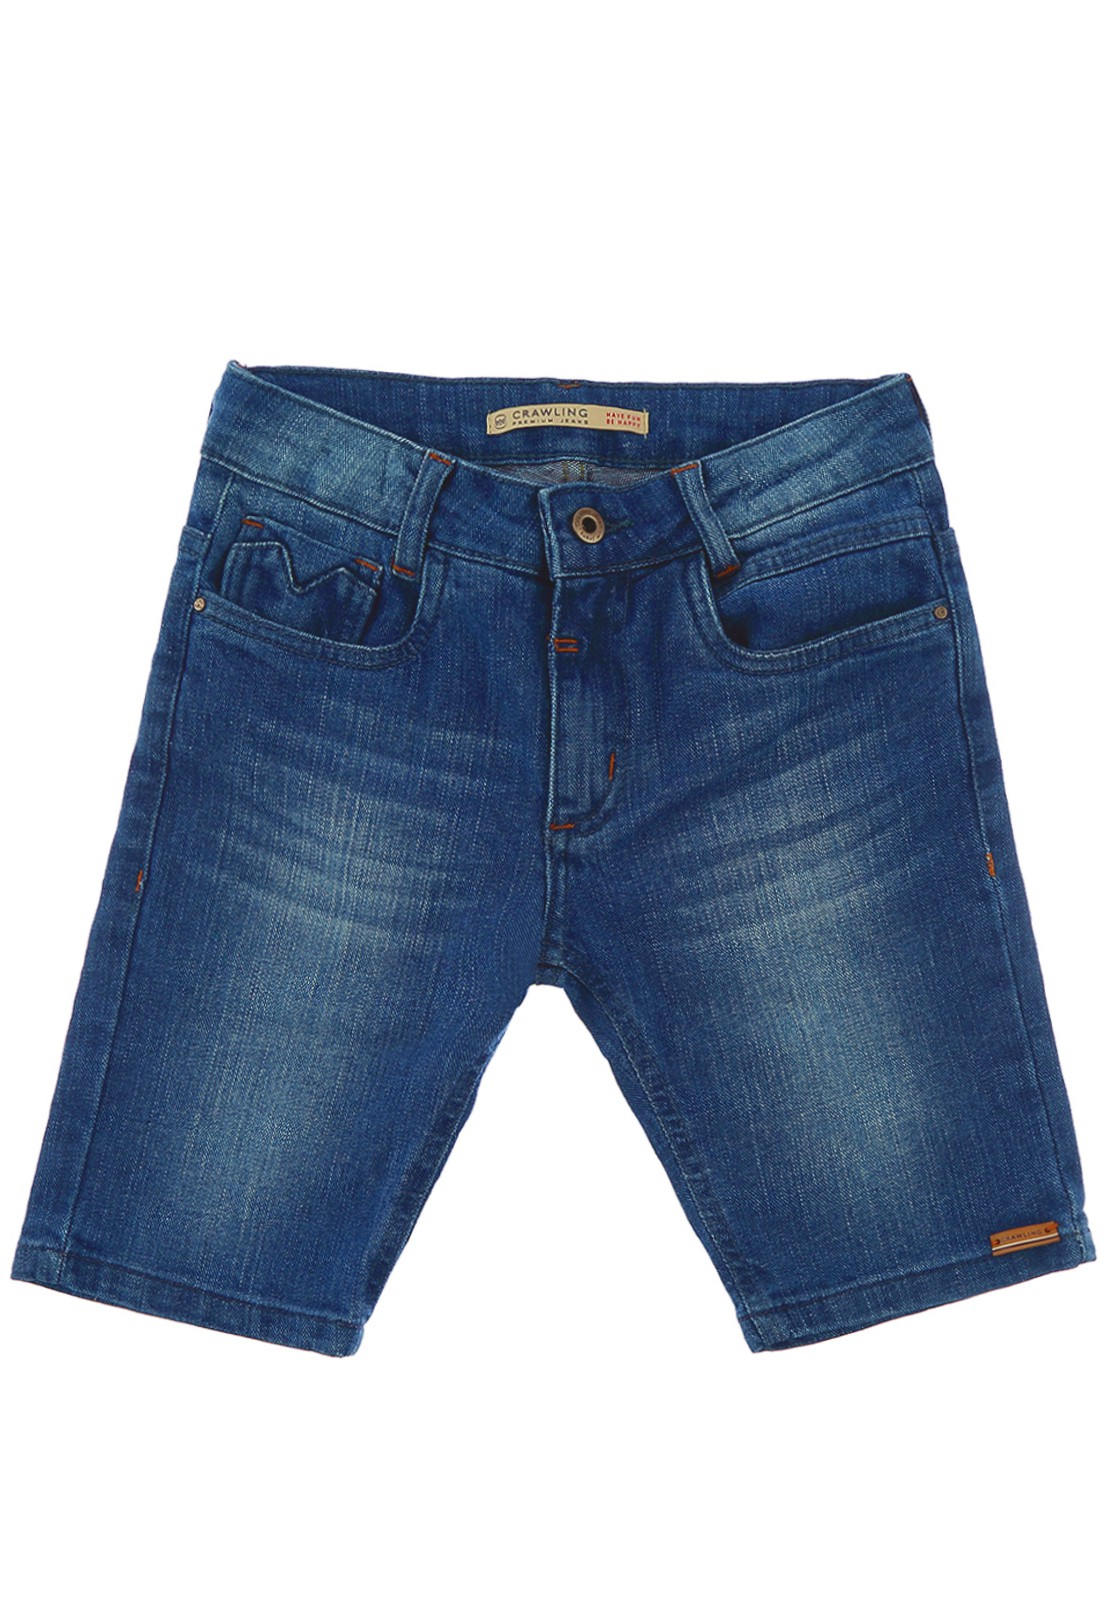 Bermuda Infantil Masculina Jeans Crawling